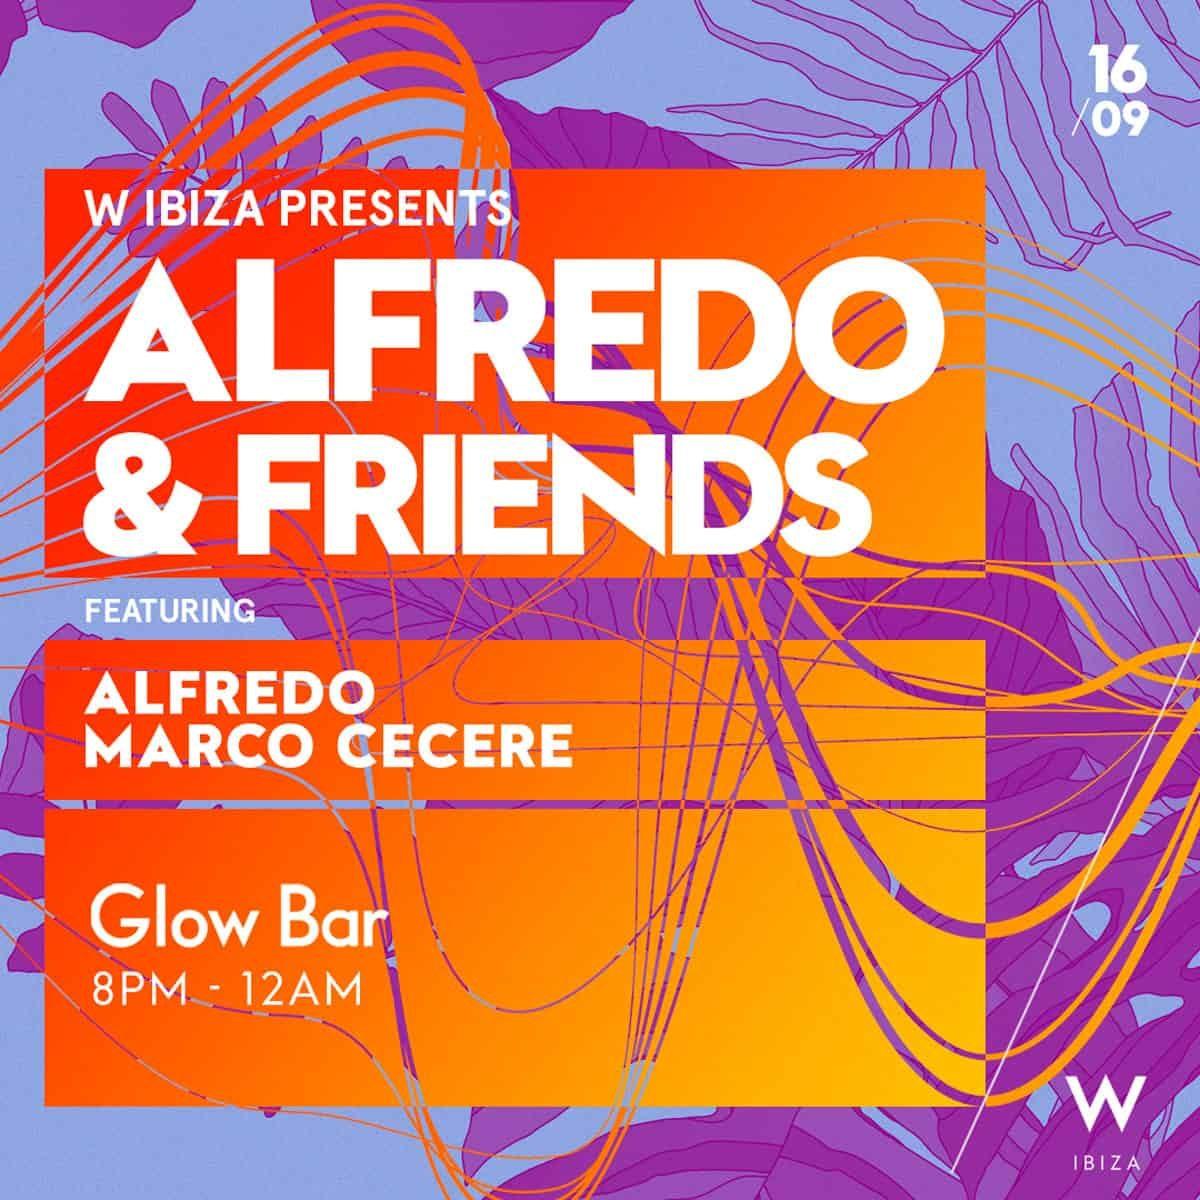 alfredo-and-friends-w-Eivissa-2021-welcometoibiza